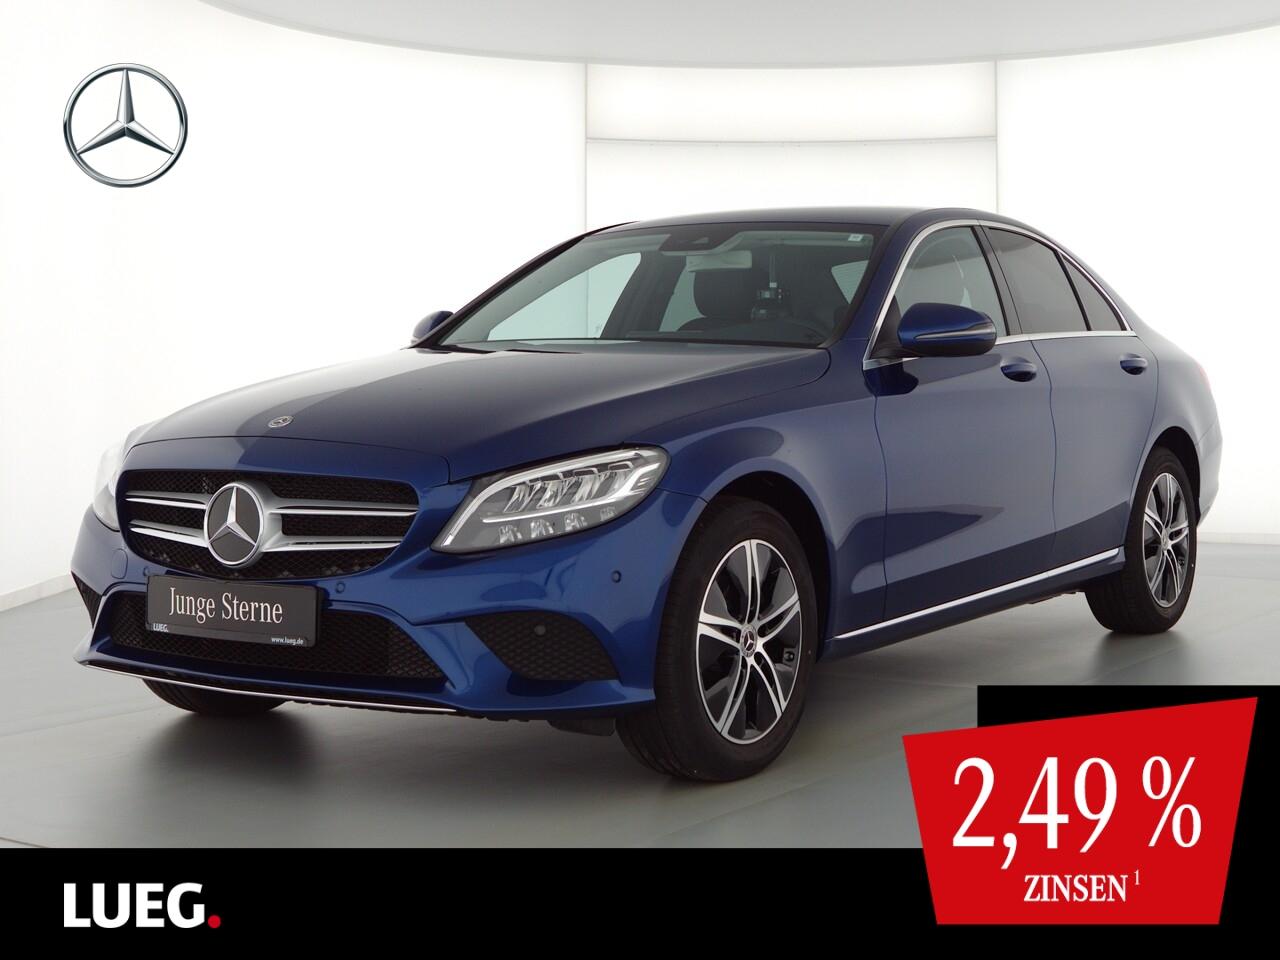 Mercedes-Benz C 180 Avantgarde+Navi+LED-HP+Burm+AParkAssistent, Jahr 2020, Benzin